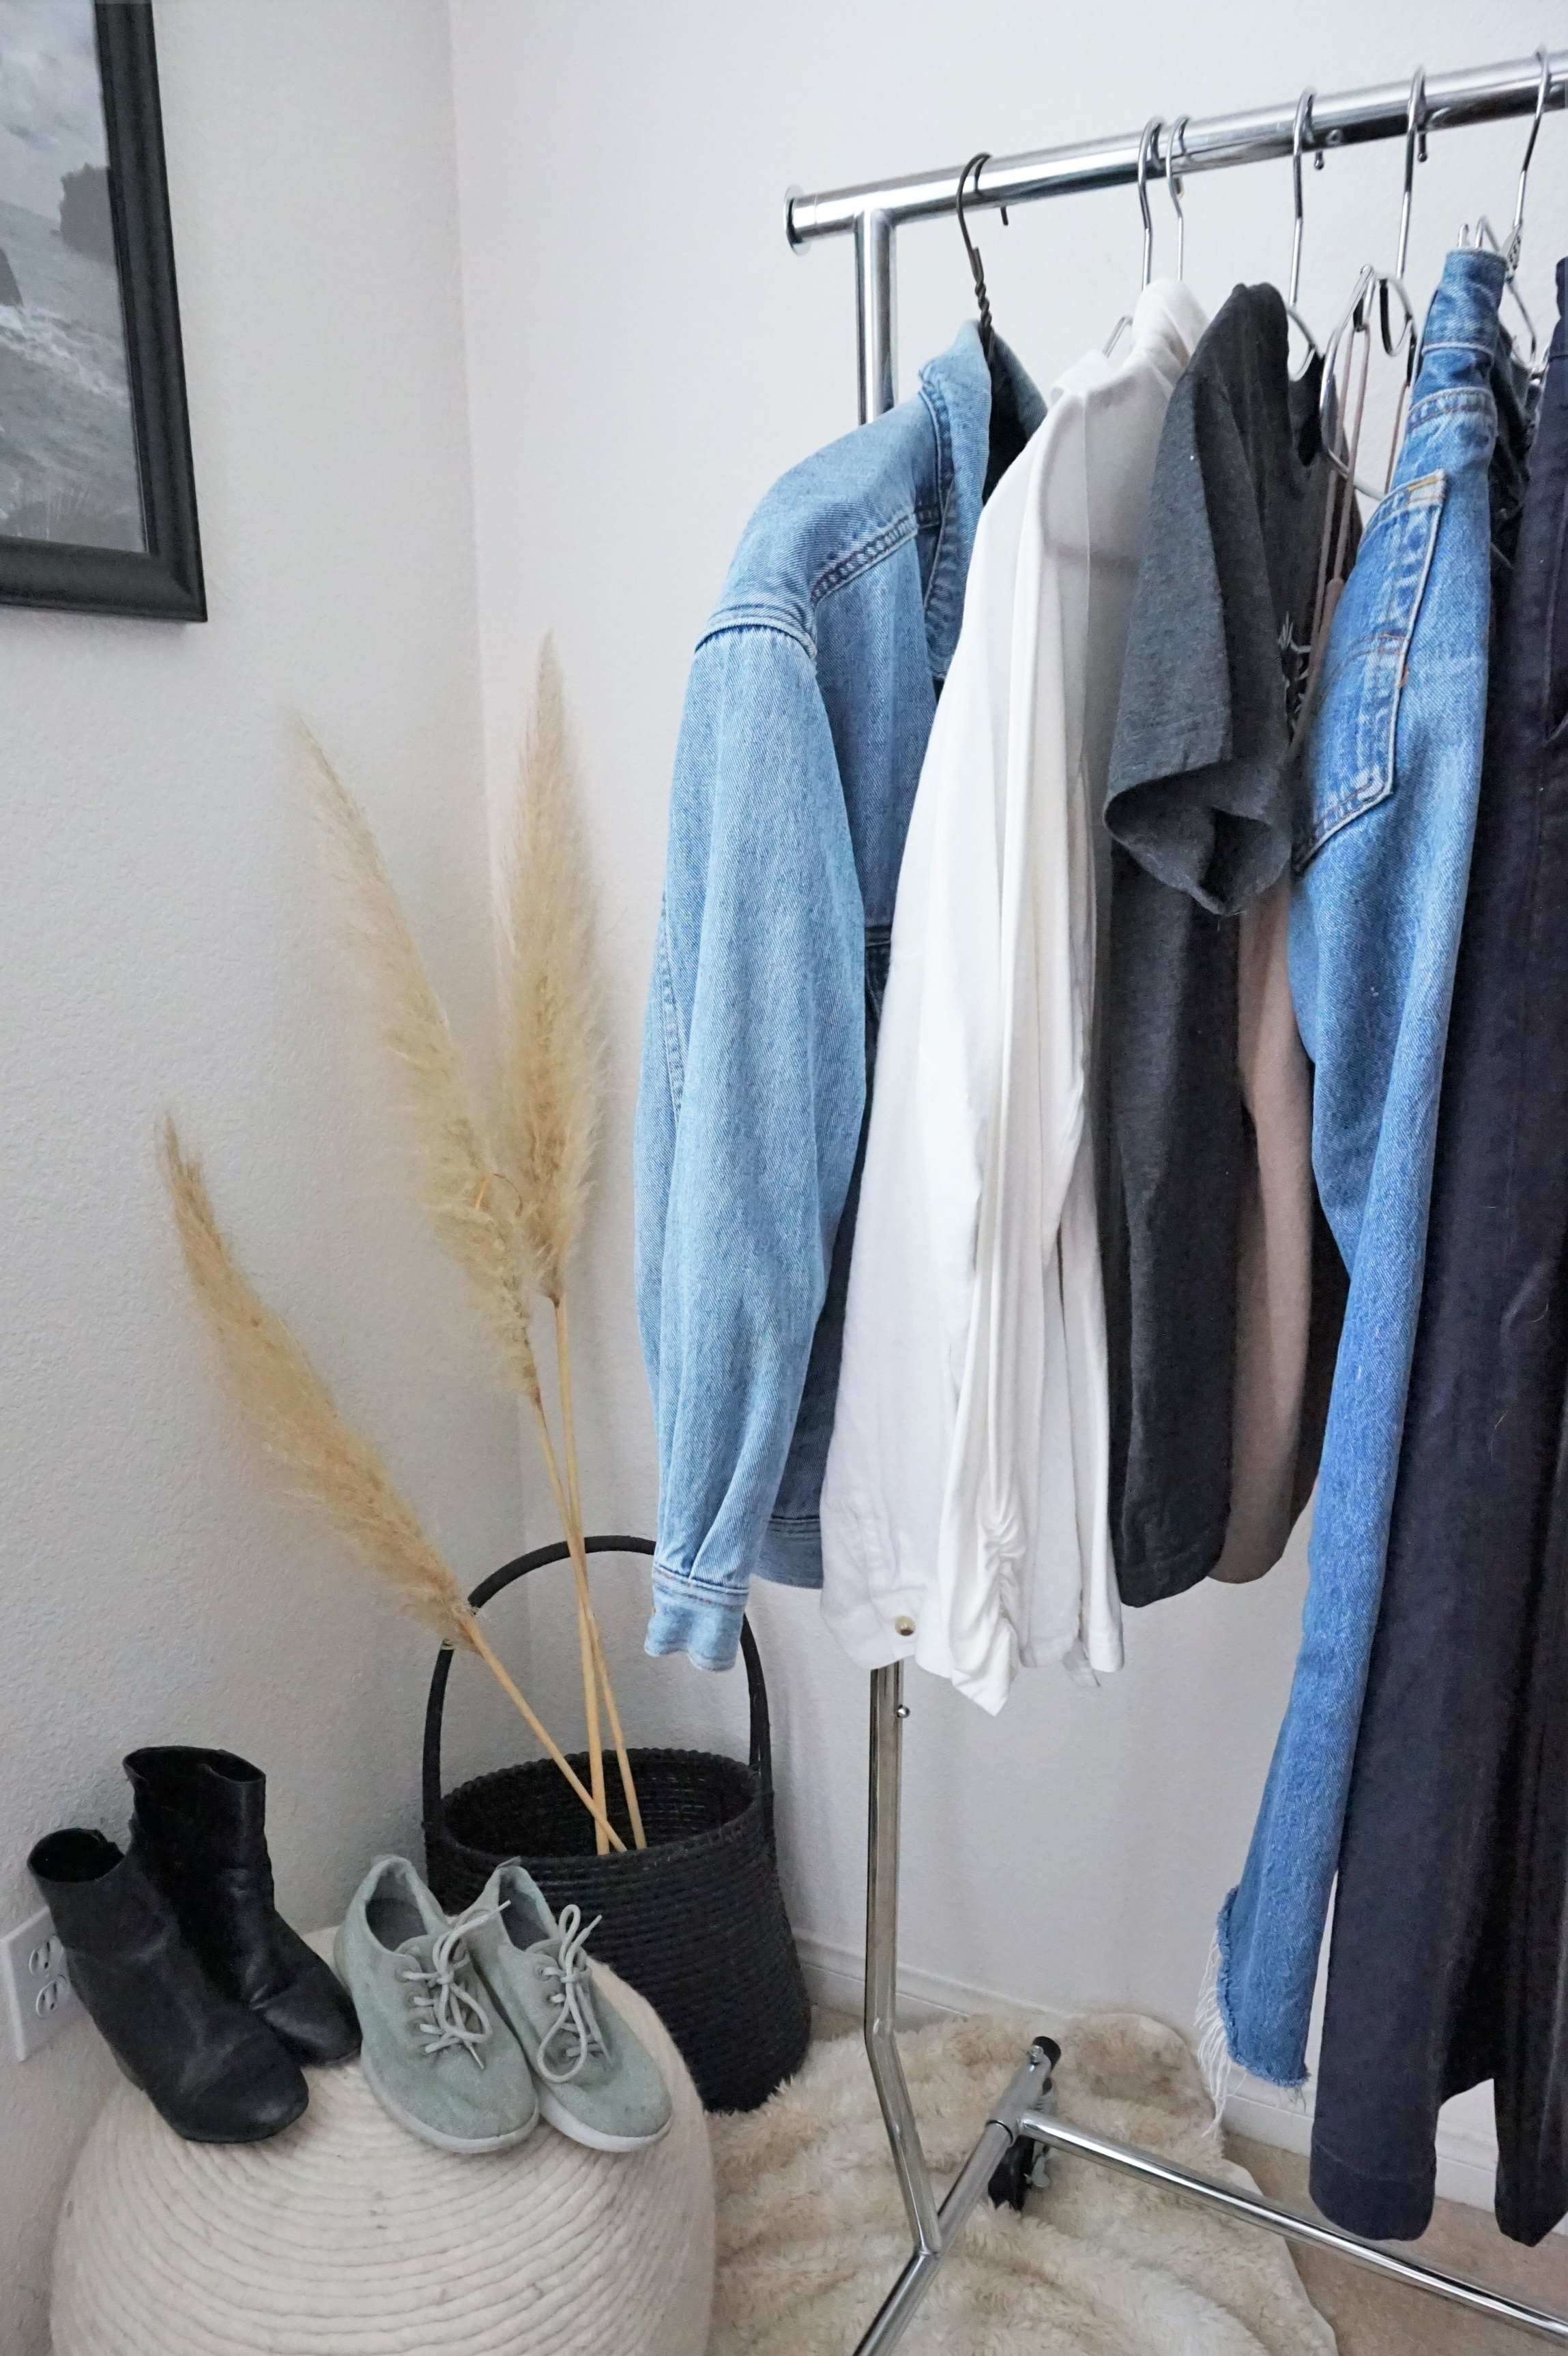 10x10 minimal clothing style challenge